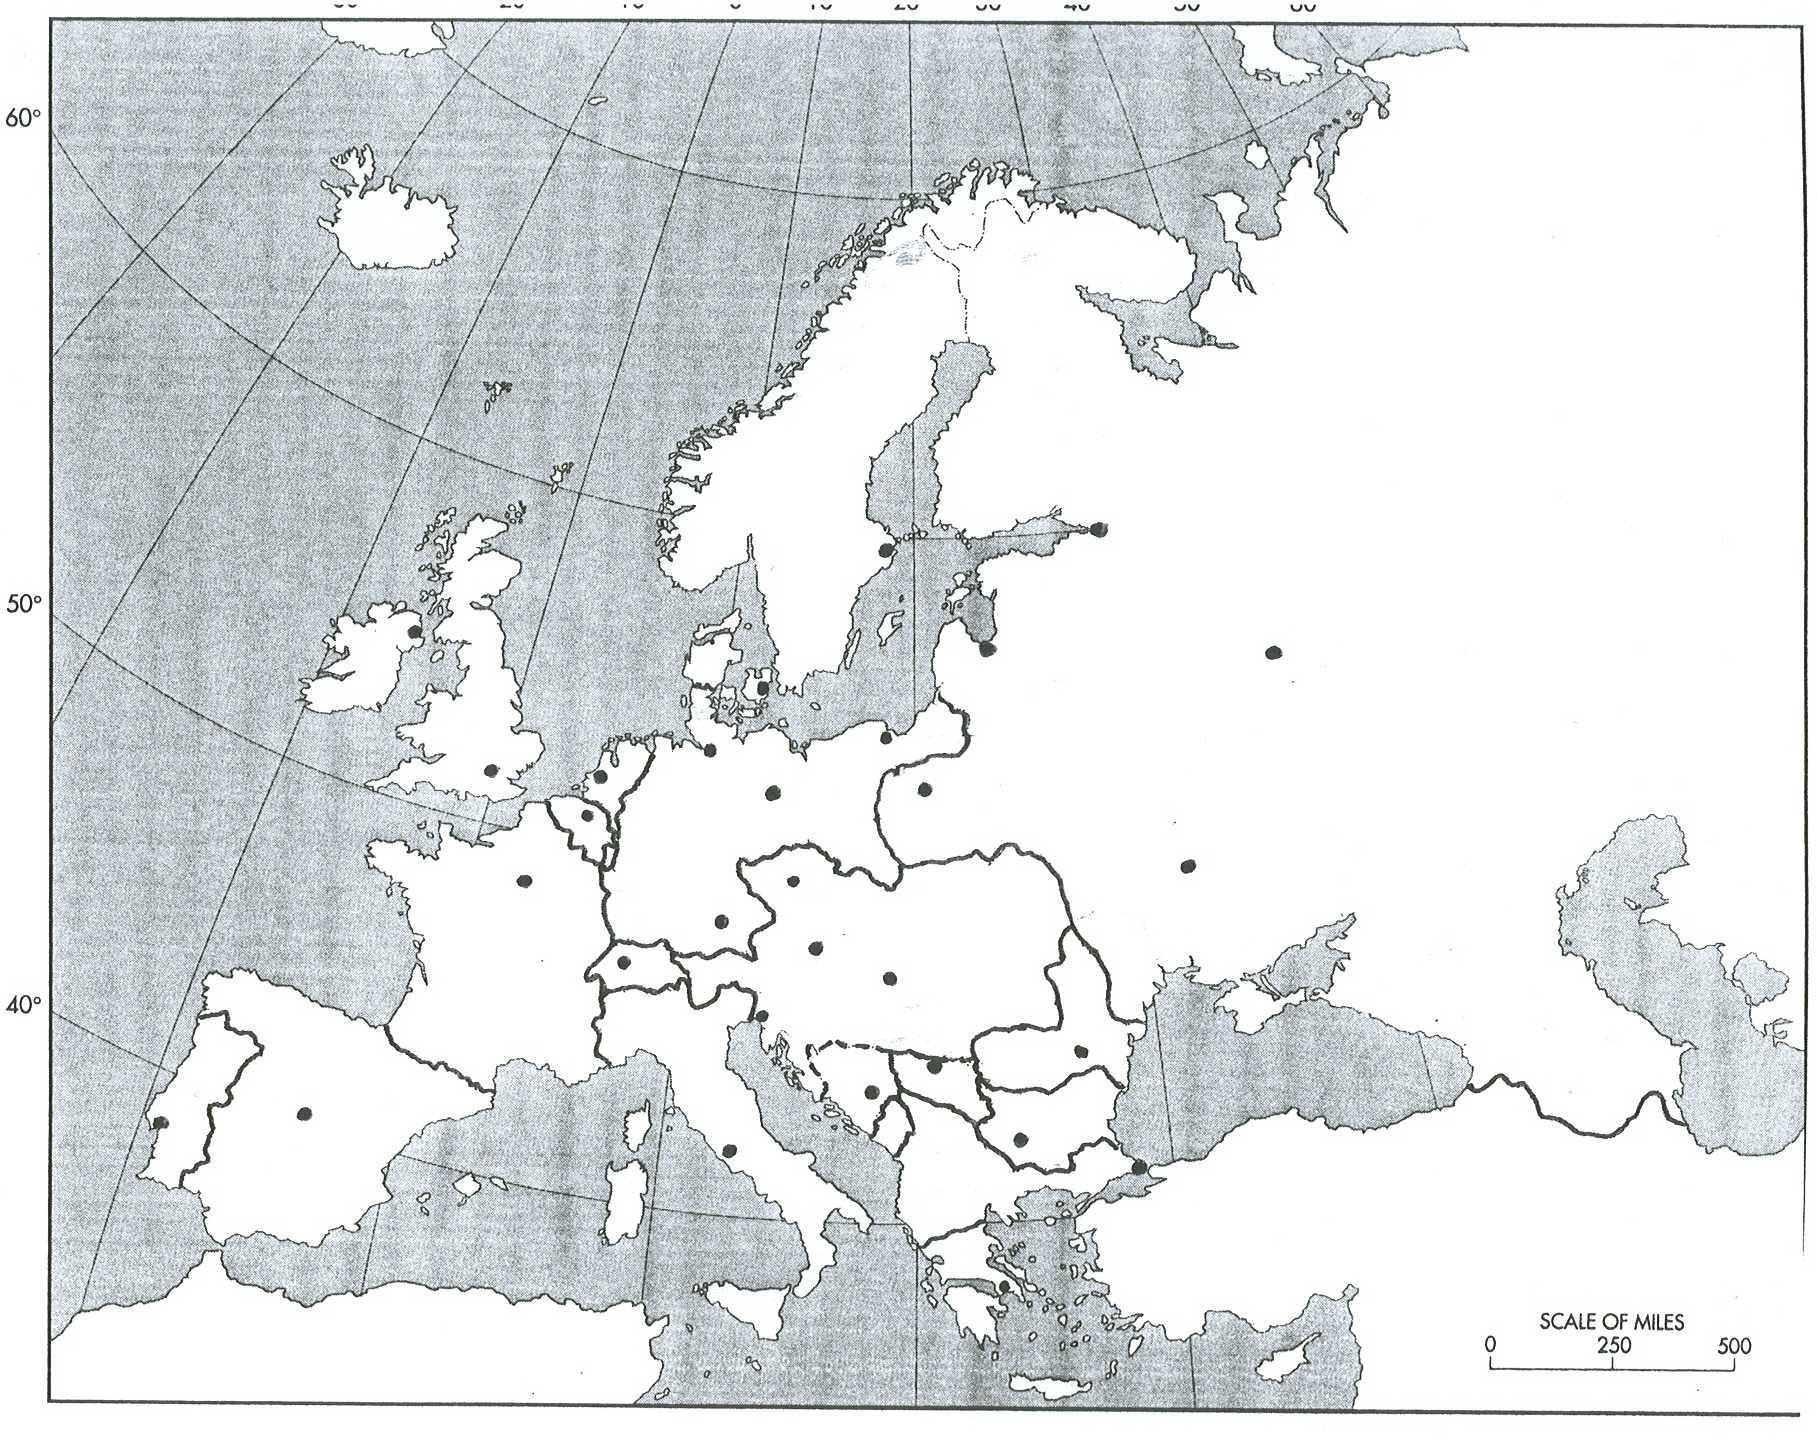 Blank Map Of Europe During World War 2